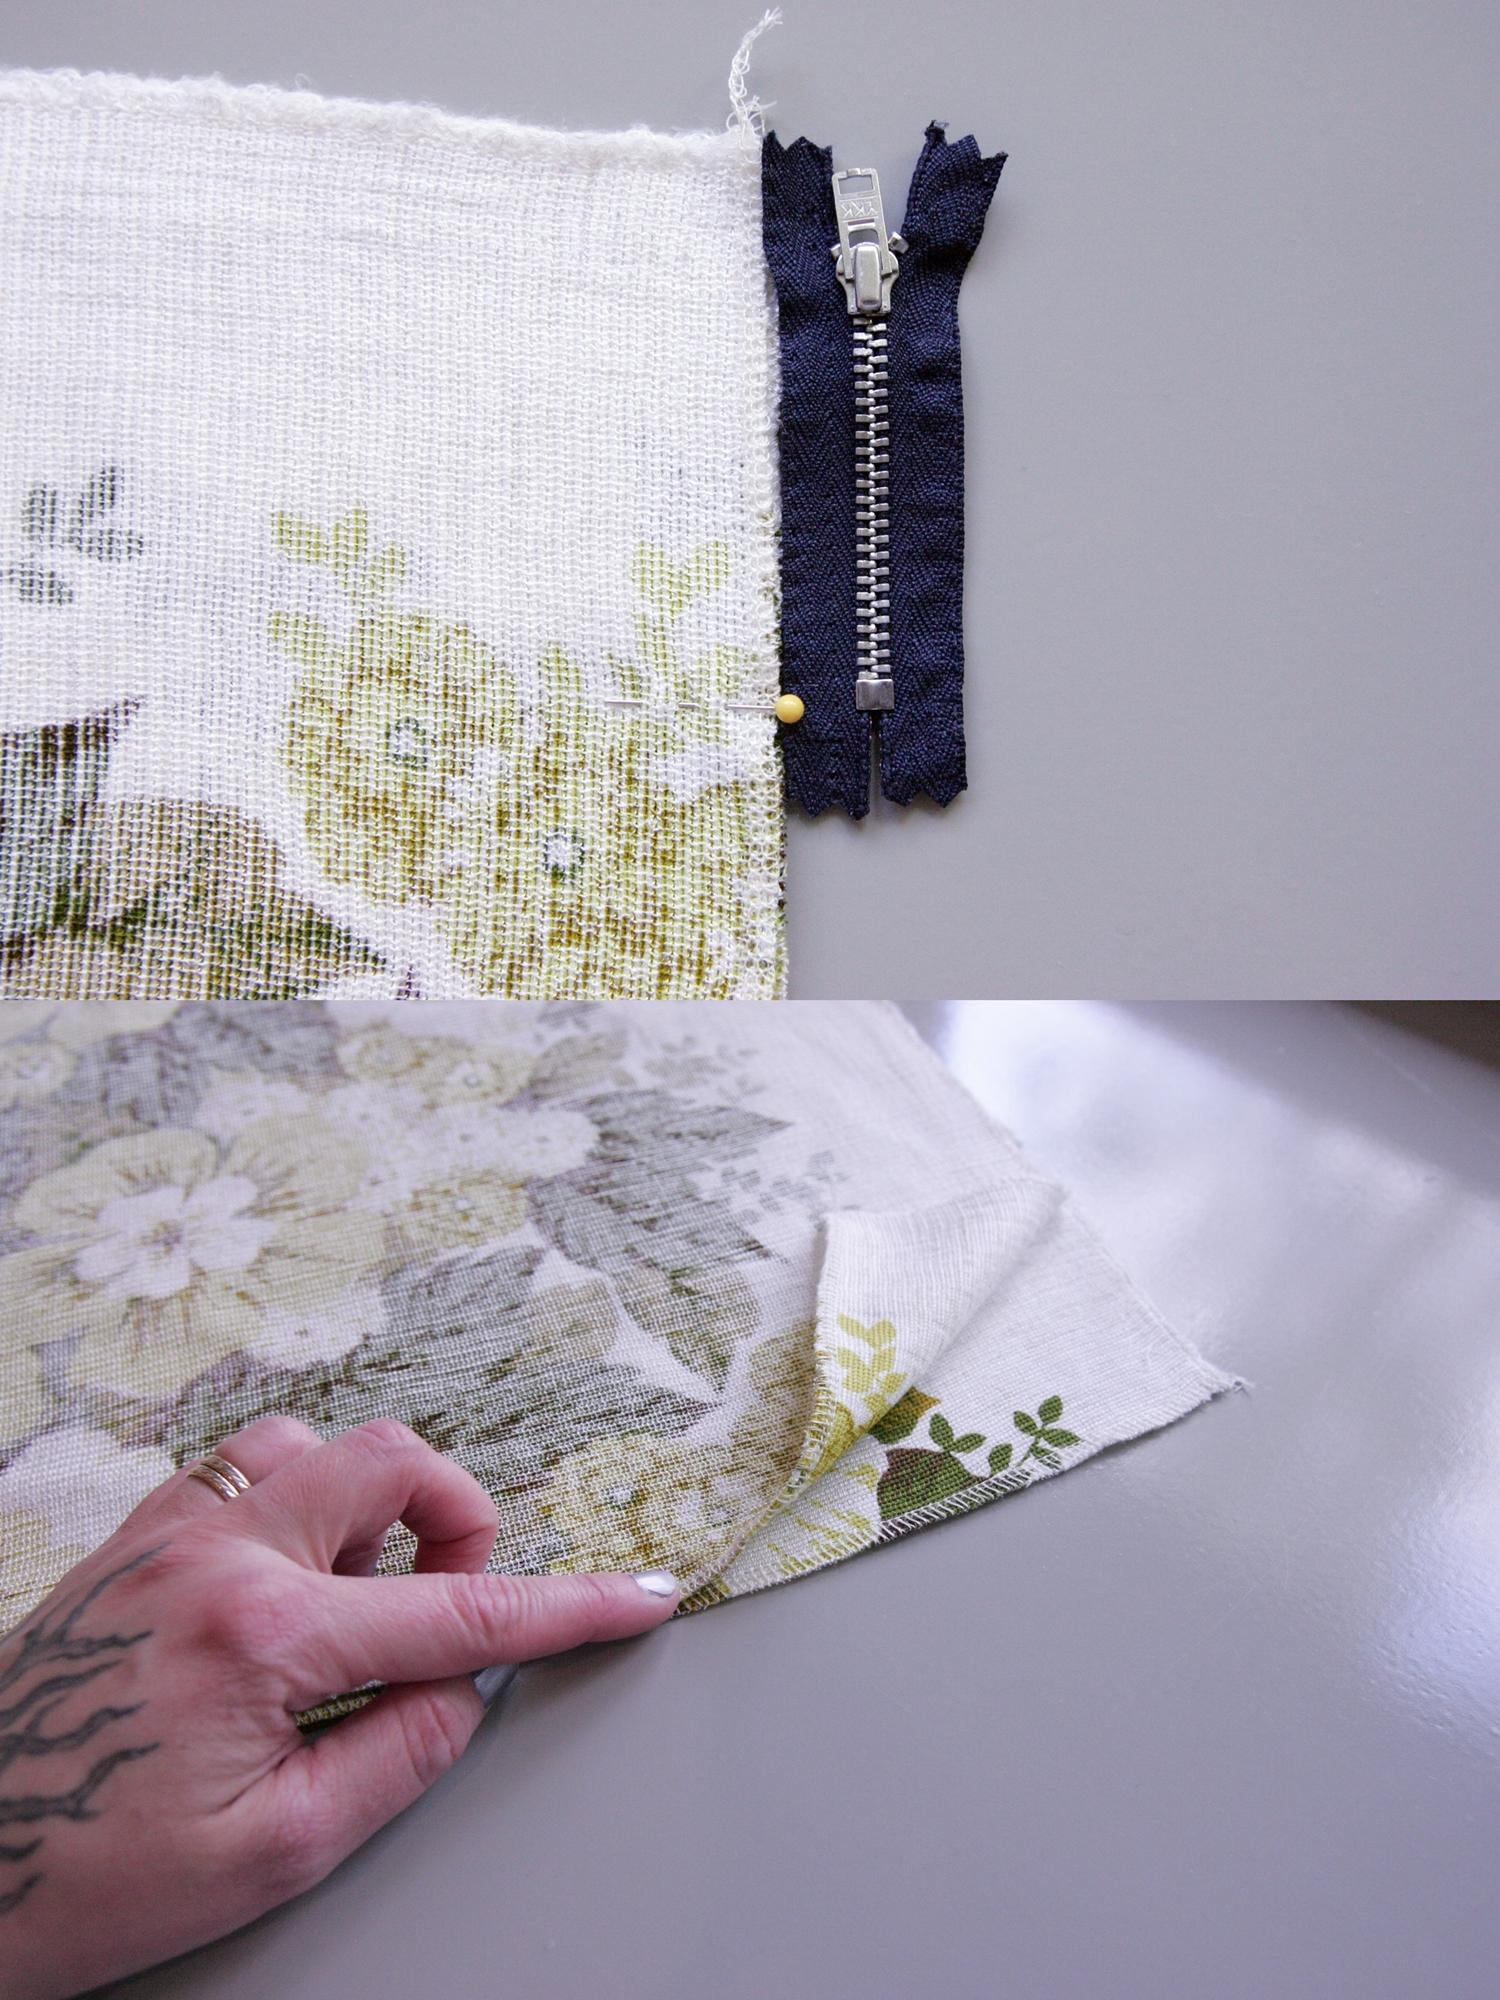 DIY summer skirt with denim waist